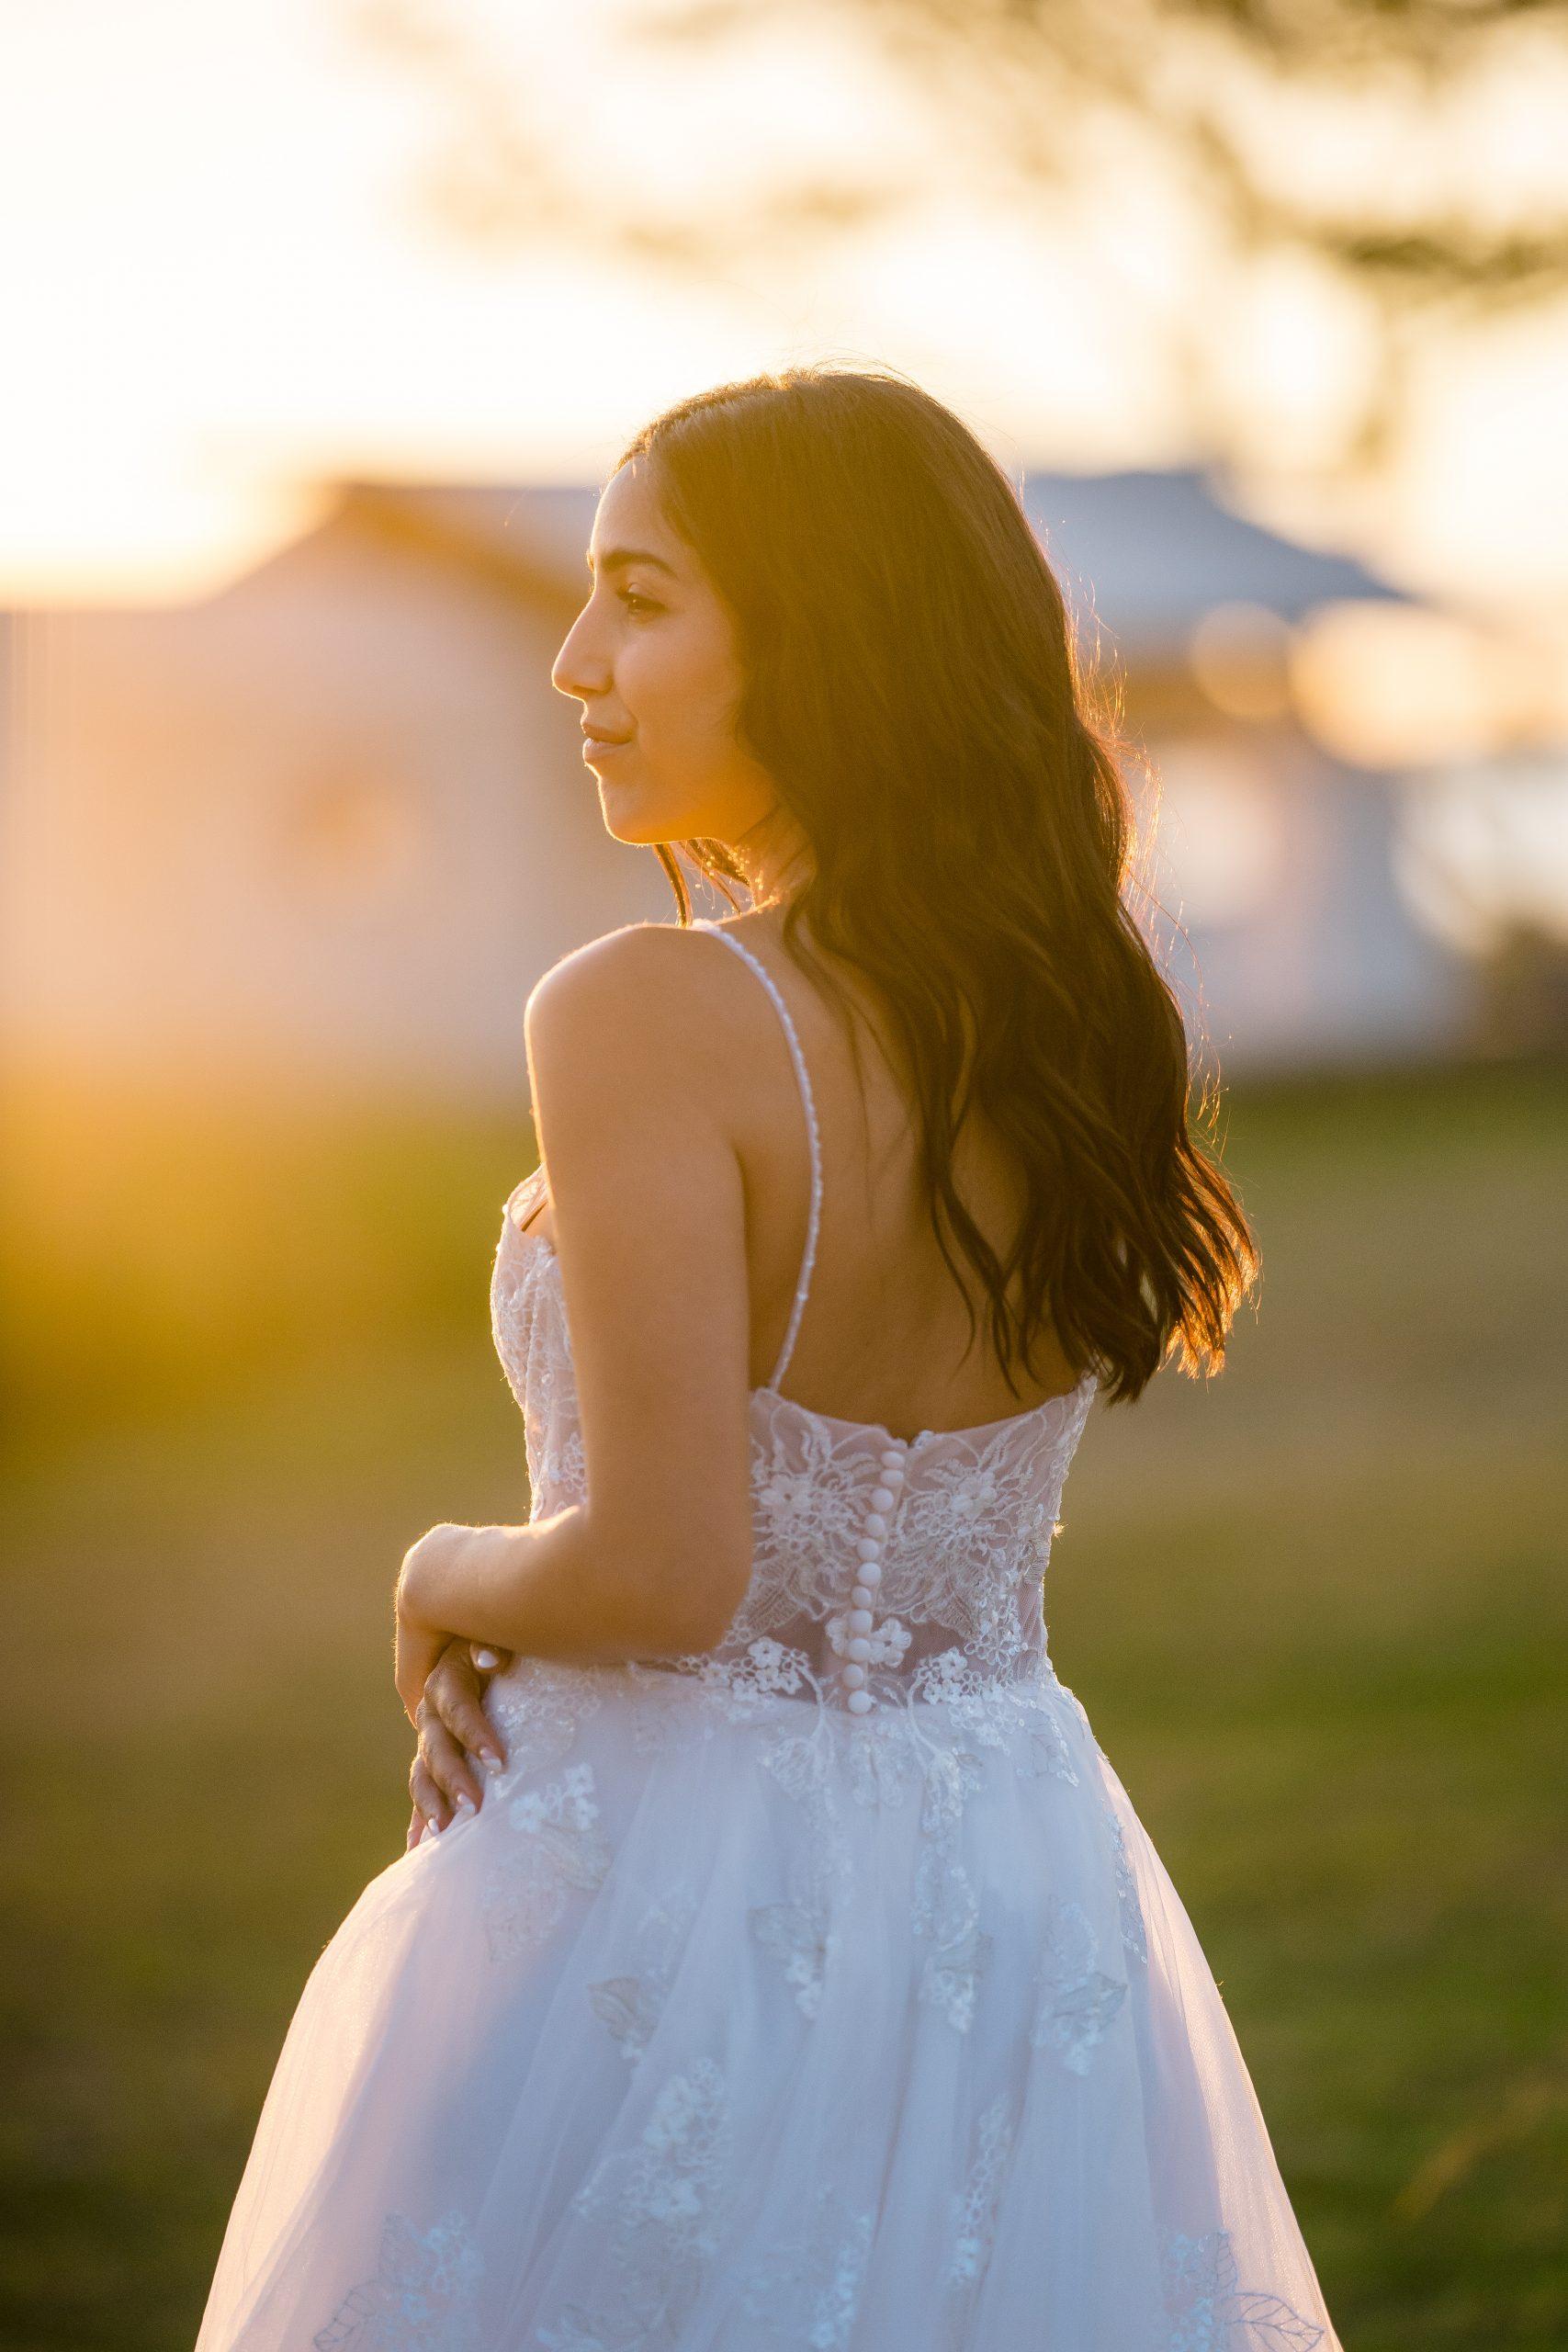 Influencer Wearing Floral Wedding Dress Called Irene by Rebecca Ingram